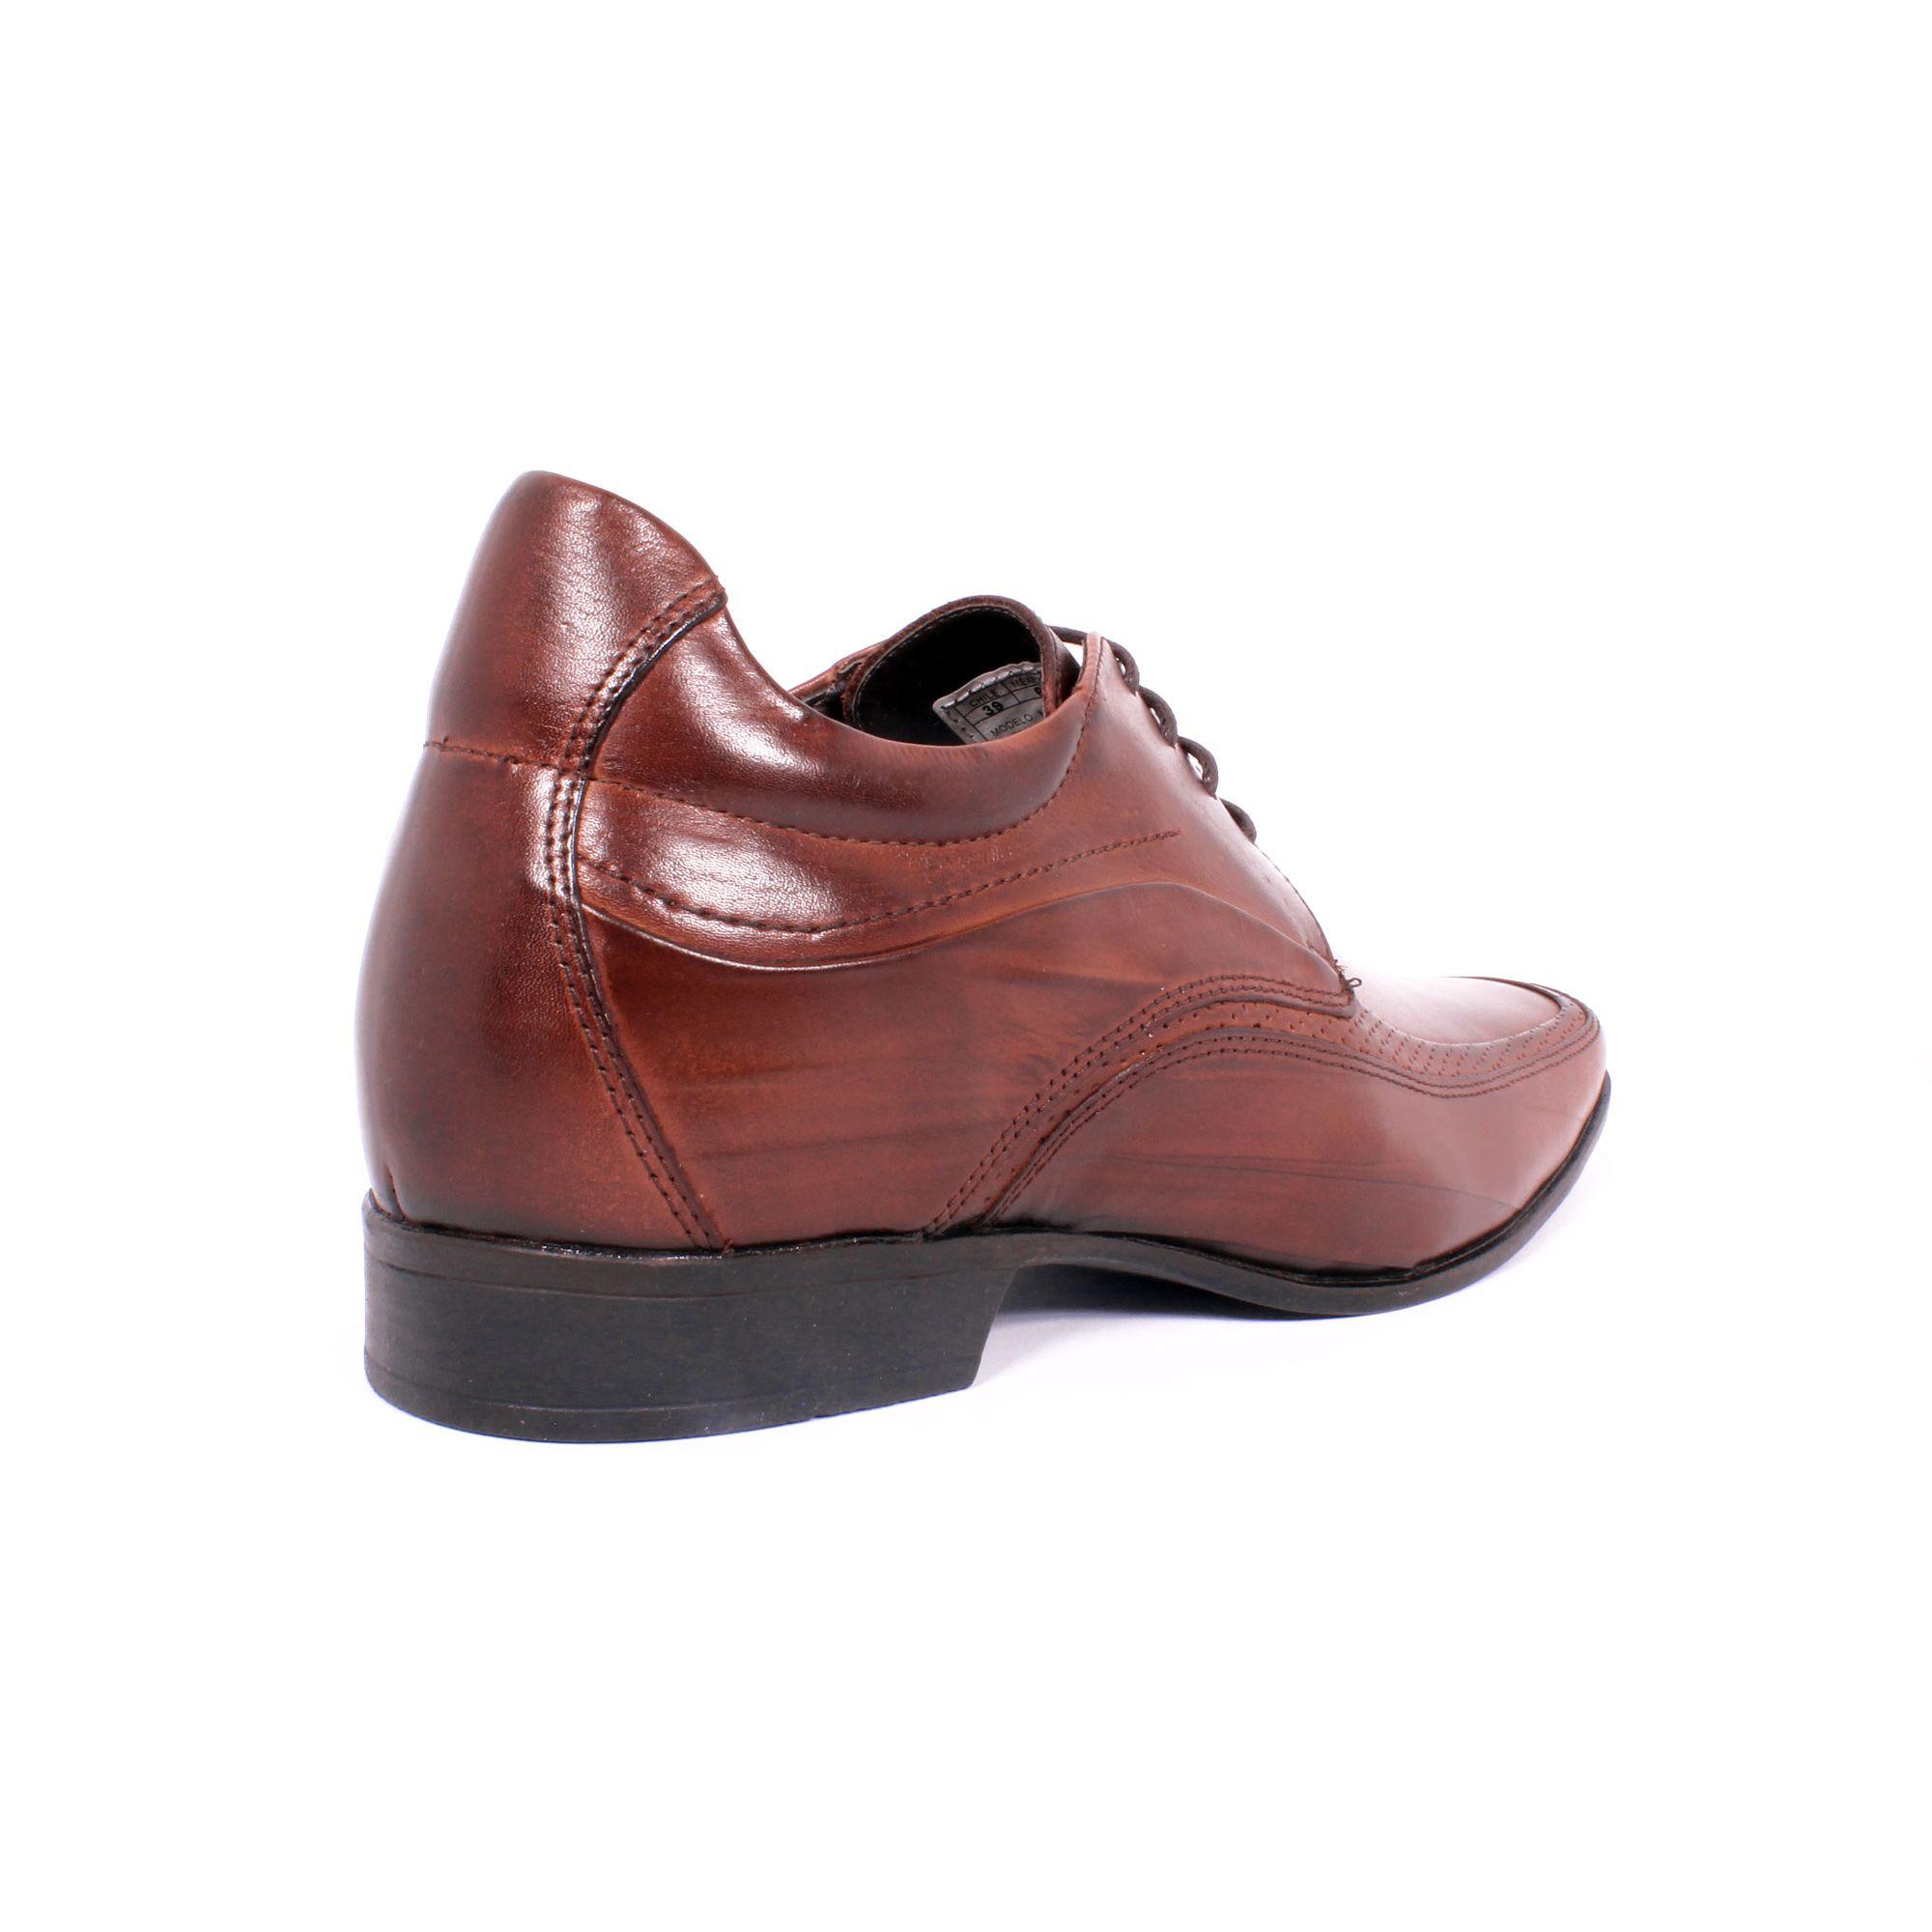 Zapato Formal Manager Café Max Denegri +7cms de Altura_70836